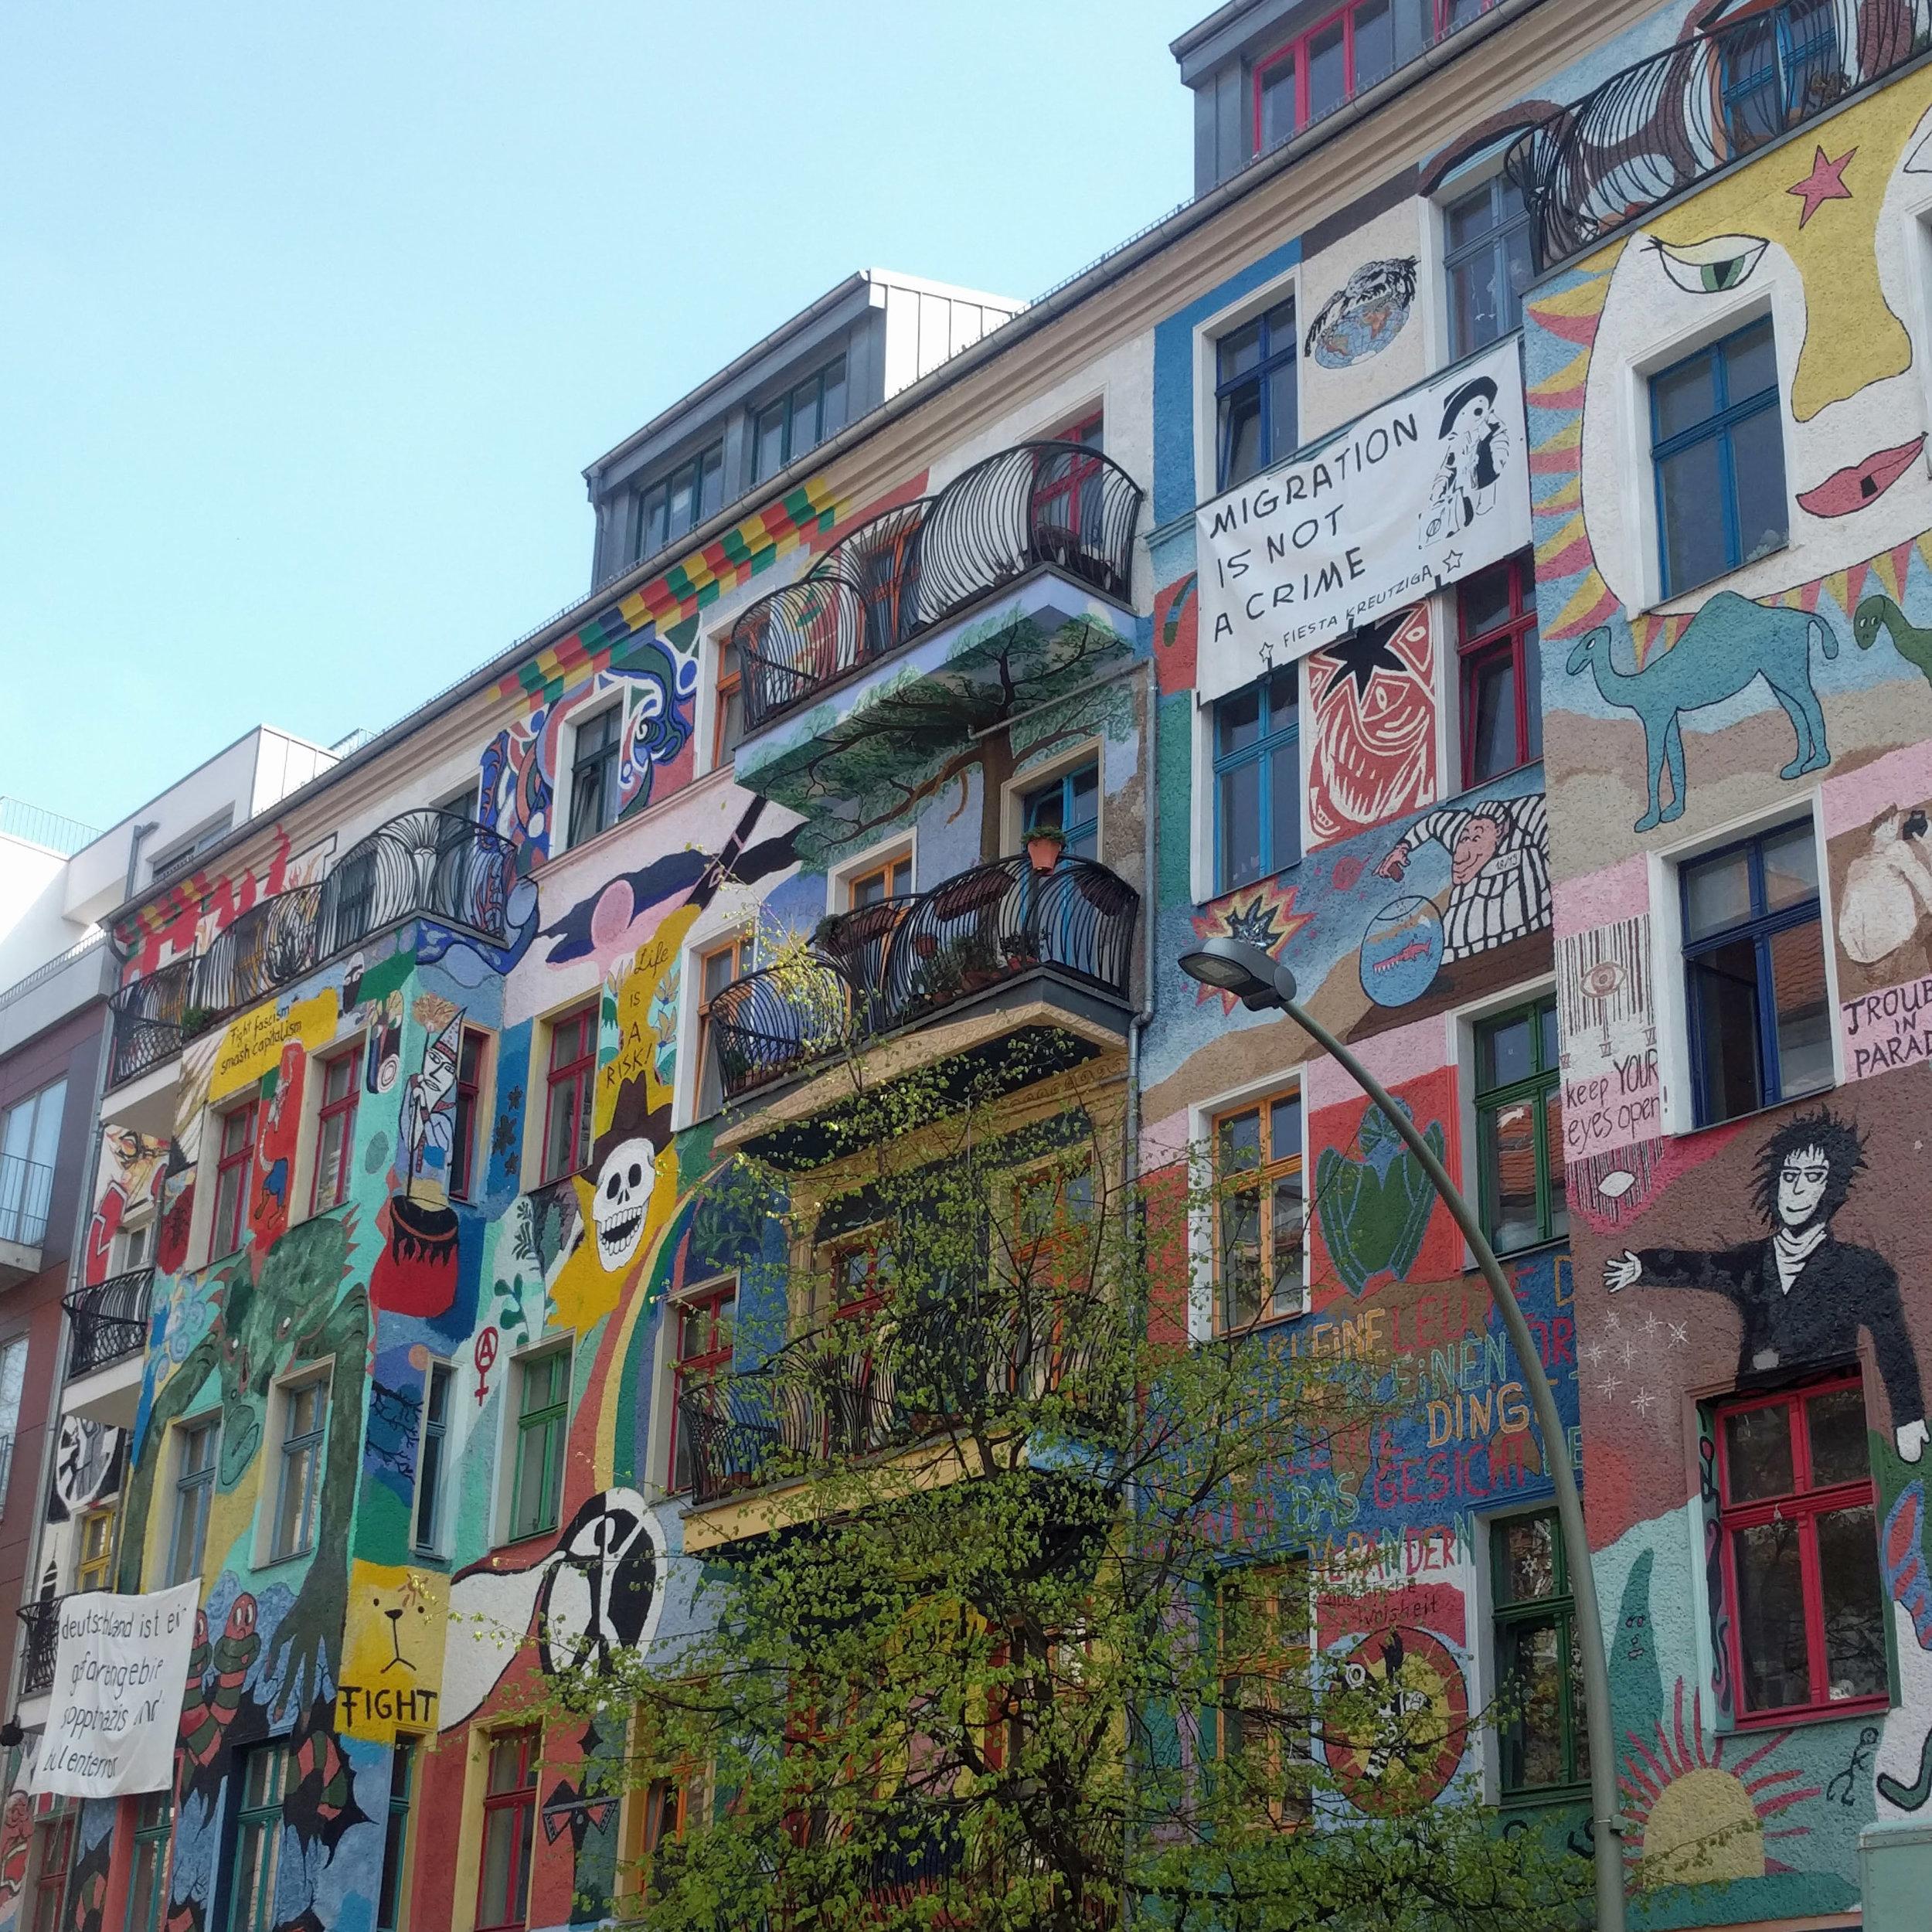 Graffiti art in Friedrichshain Berlin Germany. Colorful altbau building.